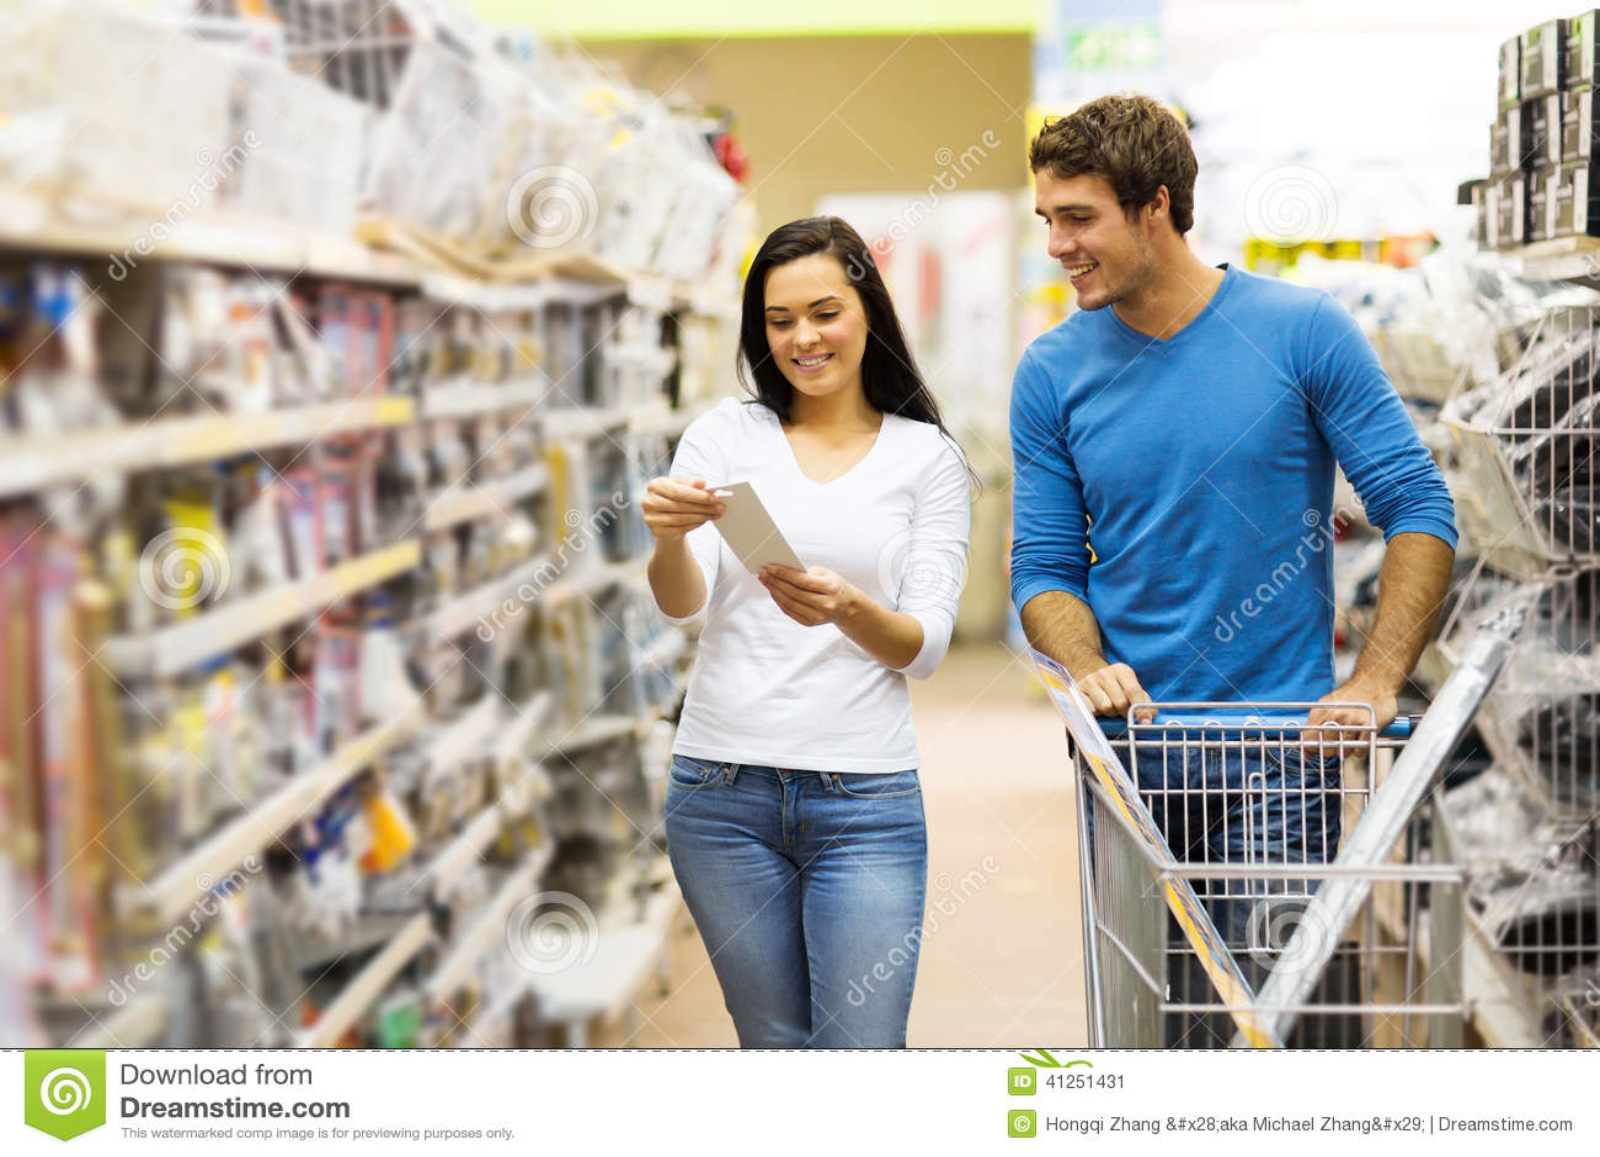 Couple Shopping Diy Tools Stock Photo Image 41251431